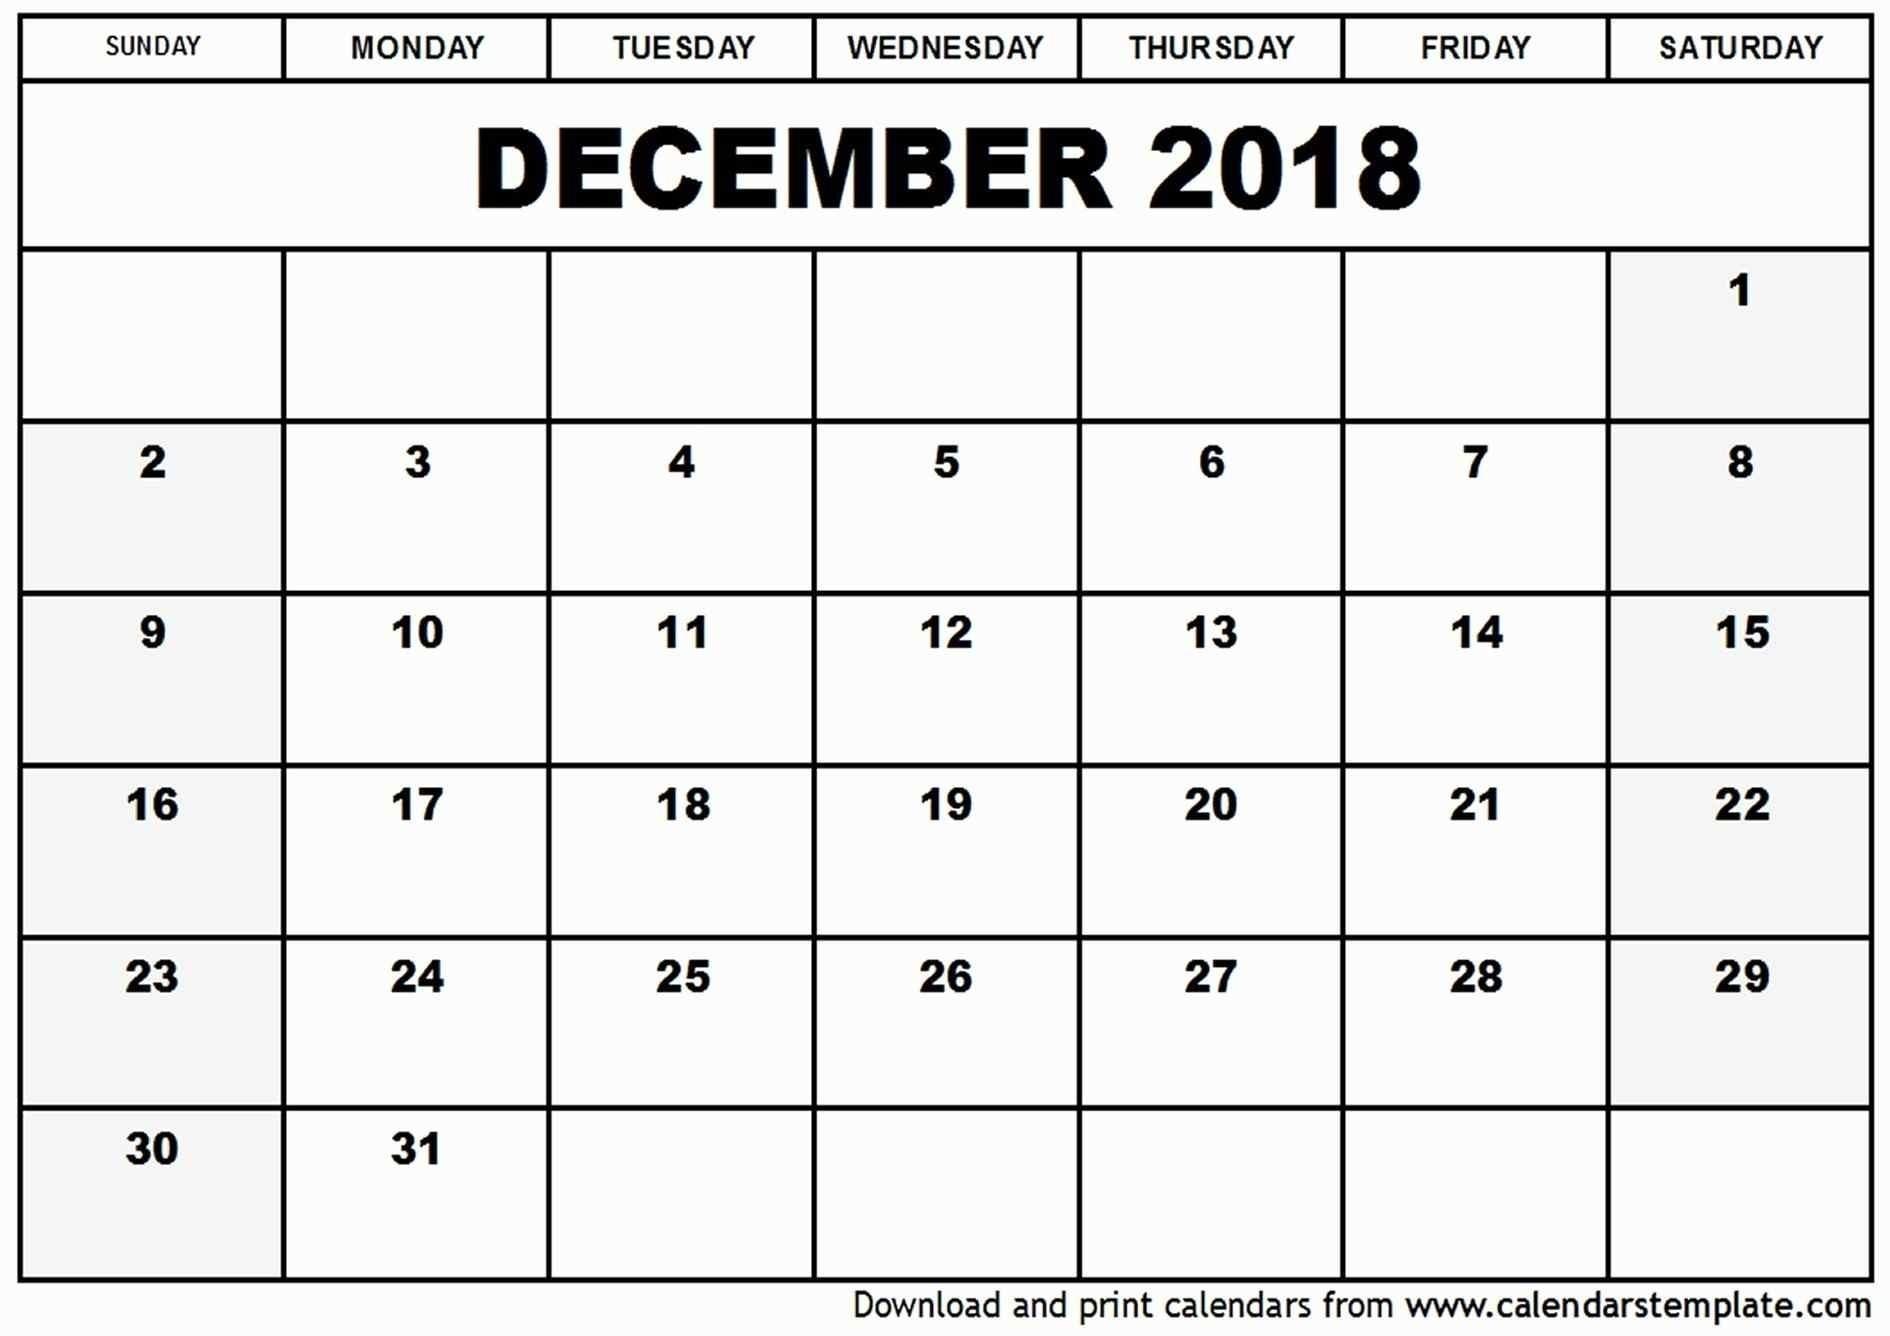 calendario 2019 argentina para imprimir word Desktop Calendar Templates Luxury Printable Calendar Feb 2019 – the Best Creative Template Design